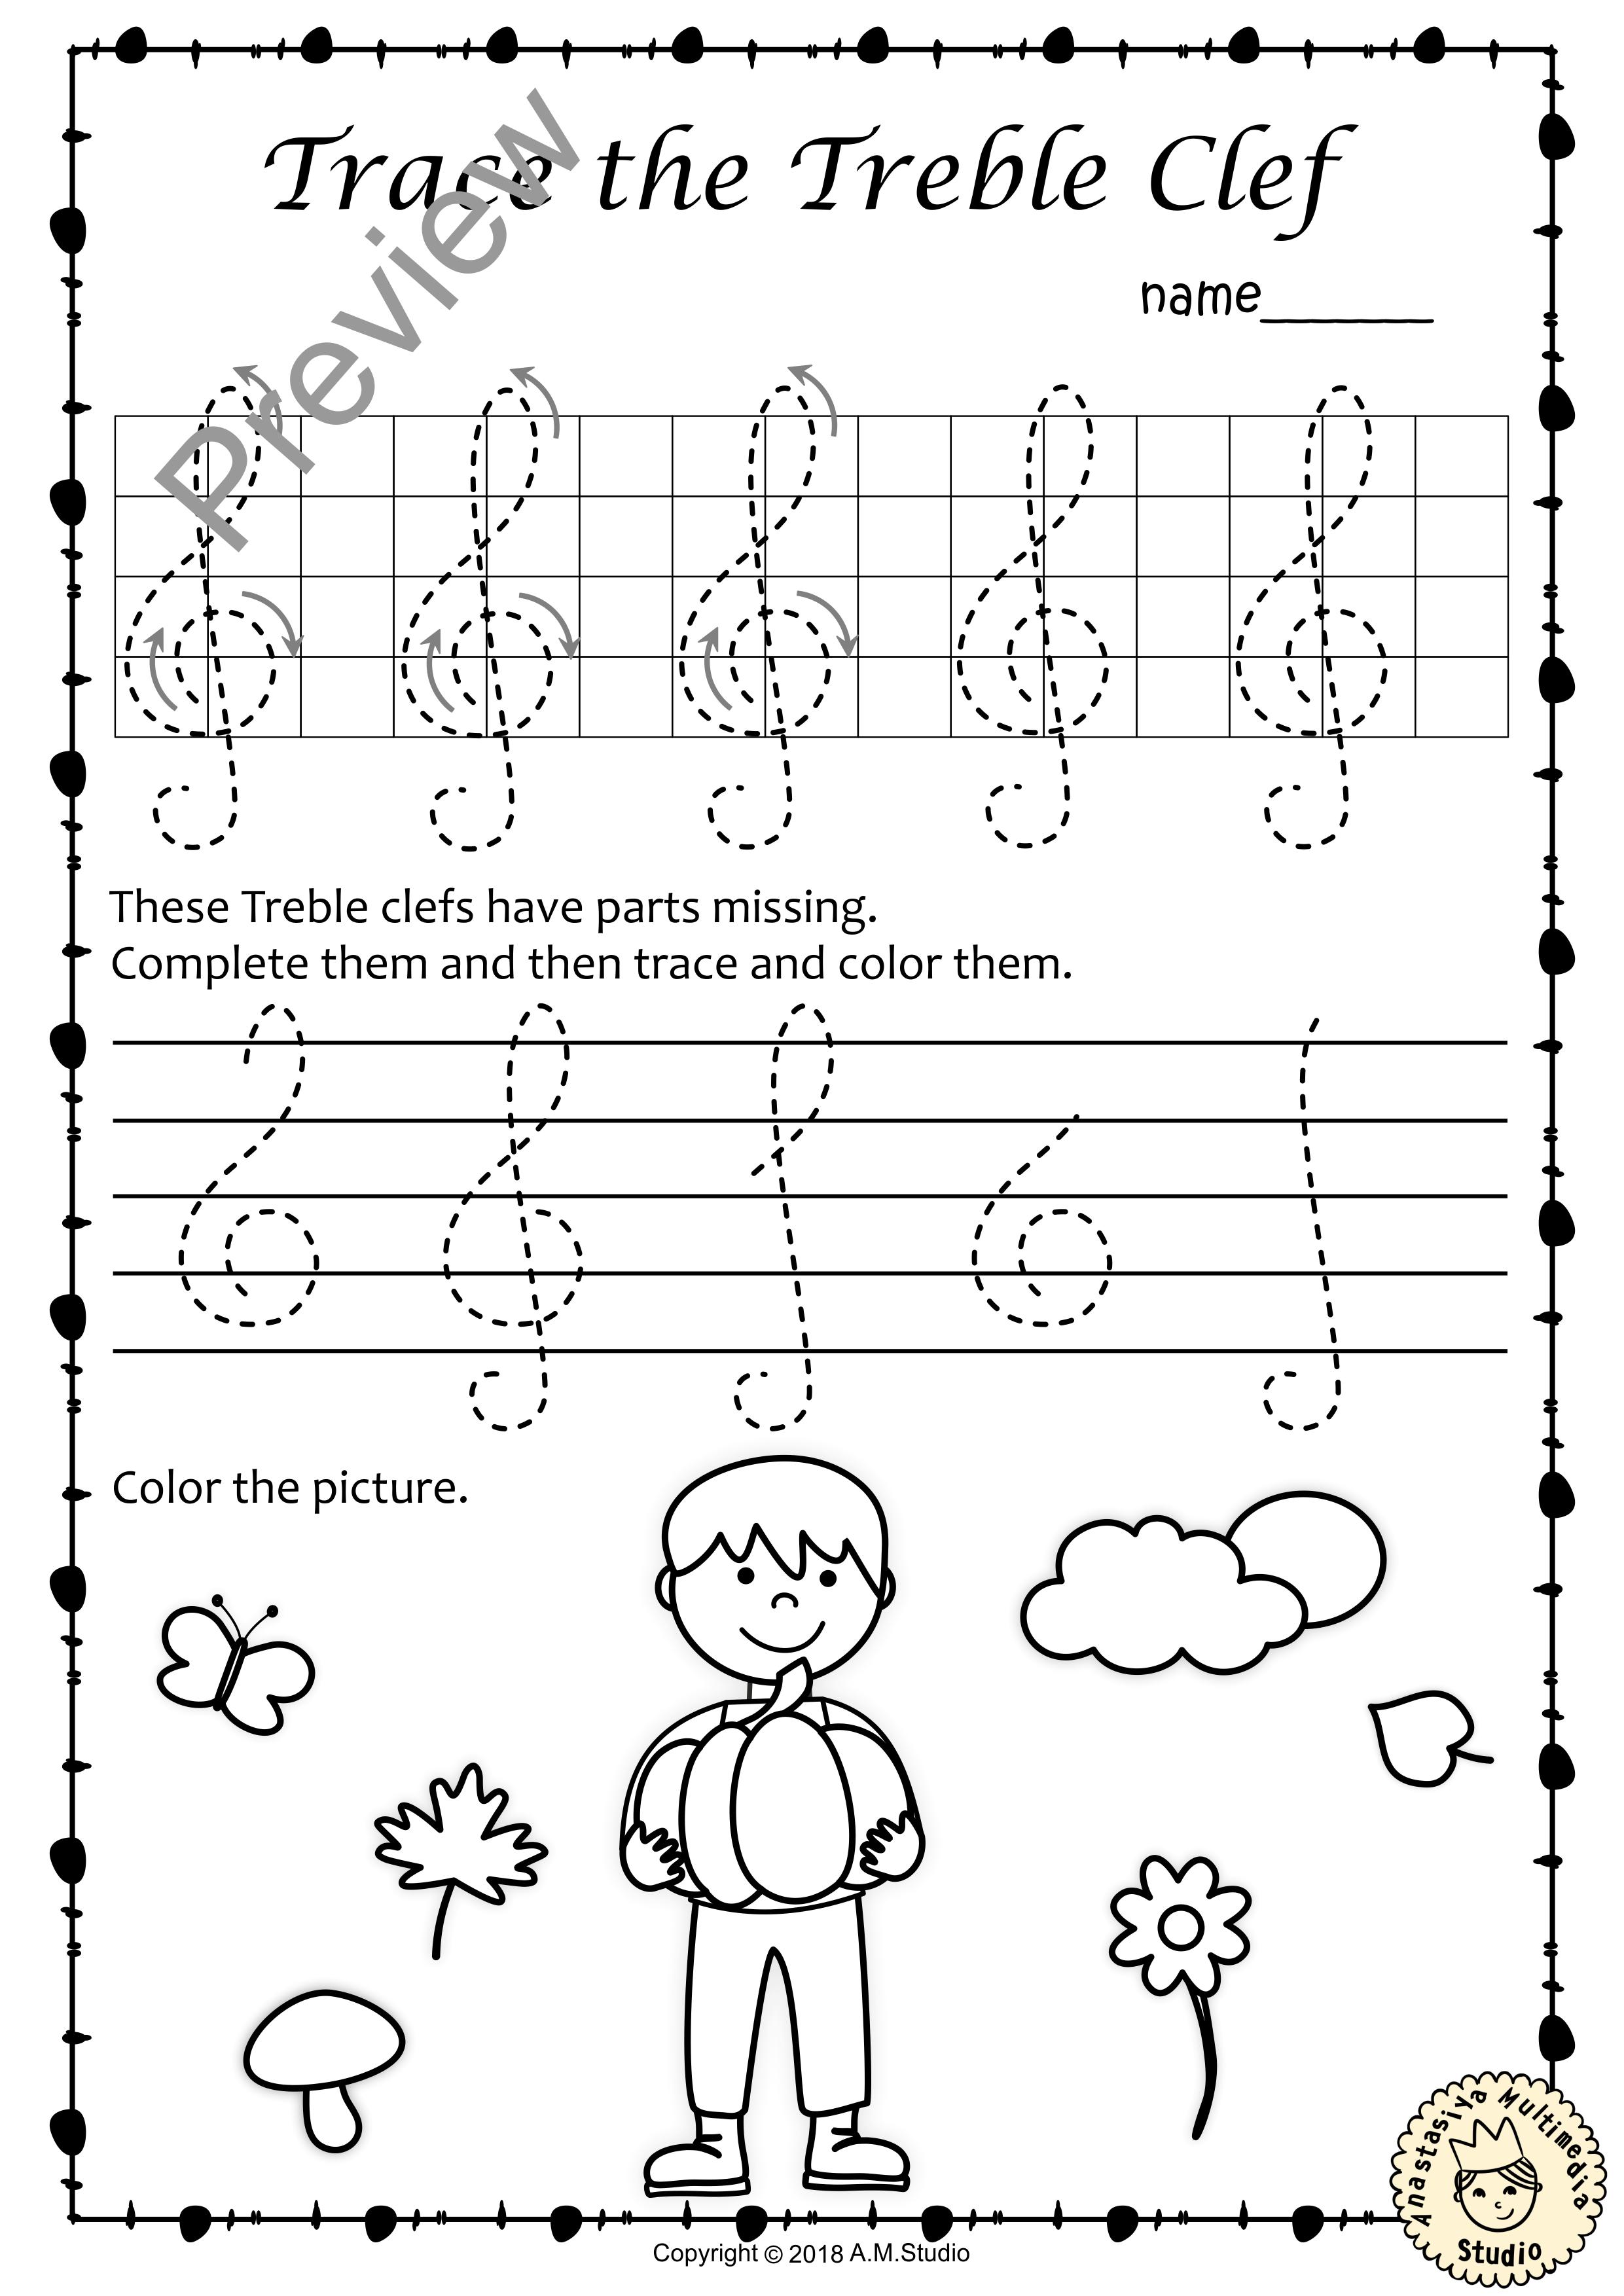 Tracing Music Notes Worksheets For Fall Anastasiya Multimedia Studio Elementary Music Worksheets Music Basics Music Lessons For Kids [ 3508 x 2481 Pixel ]